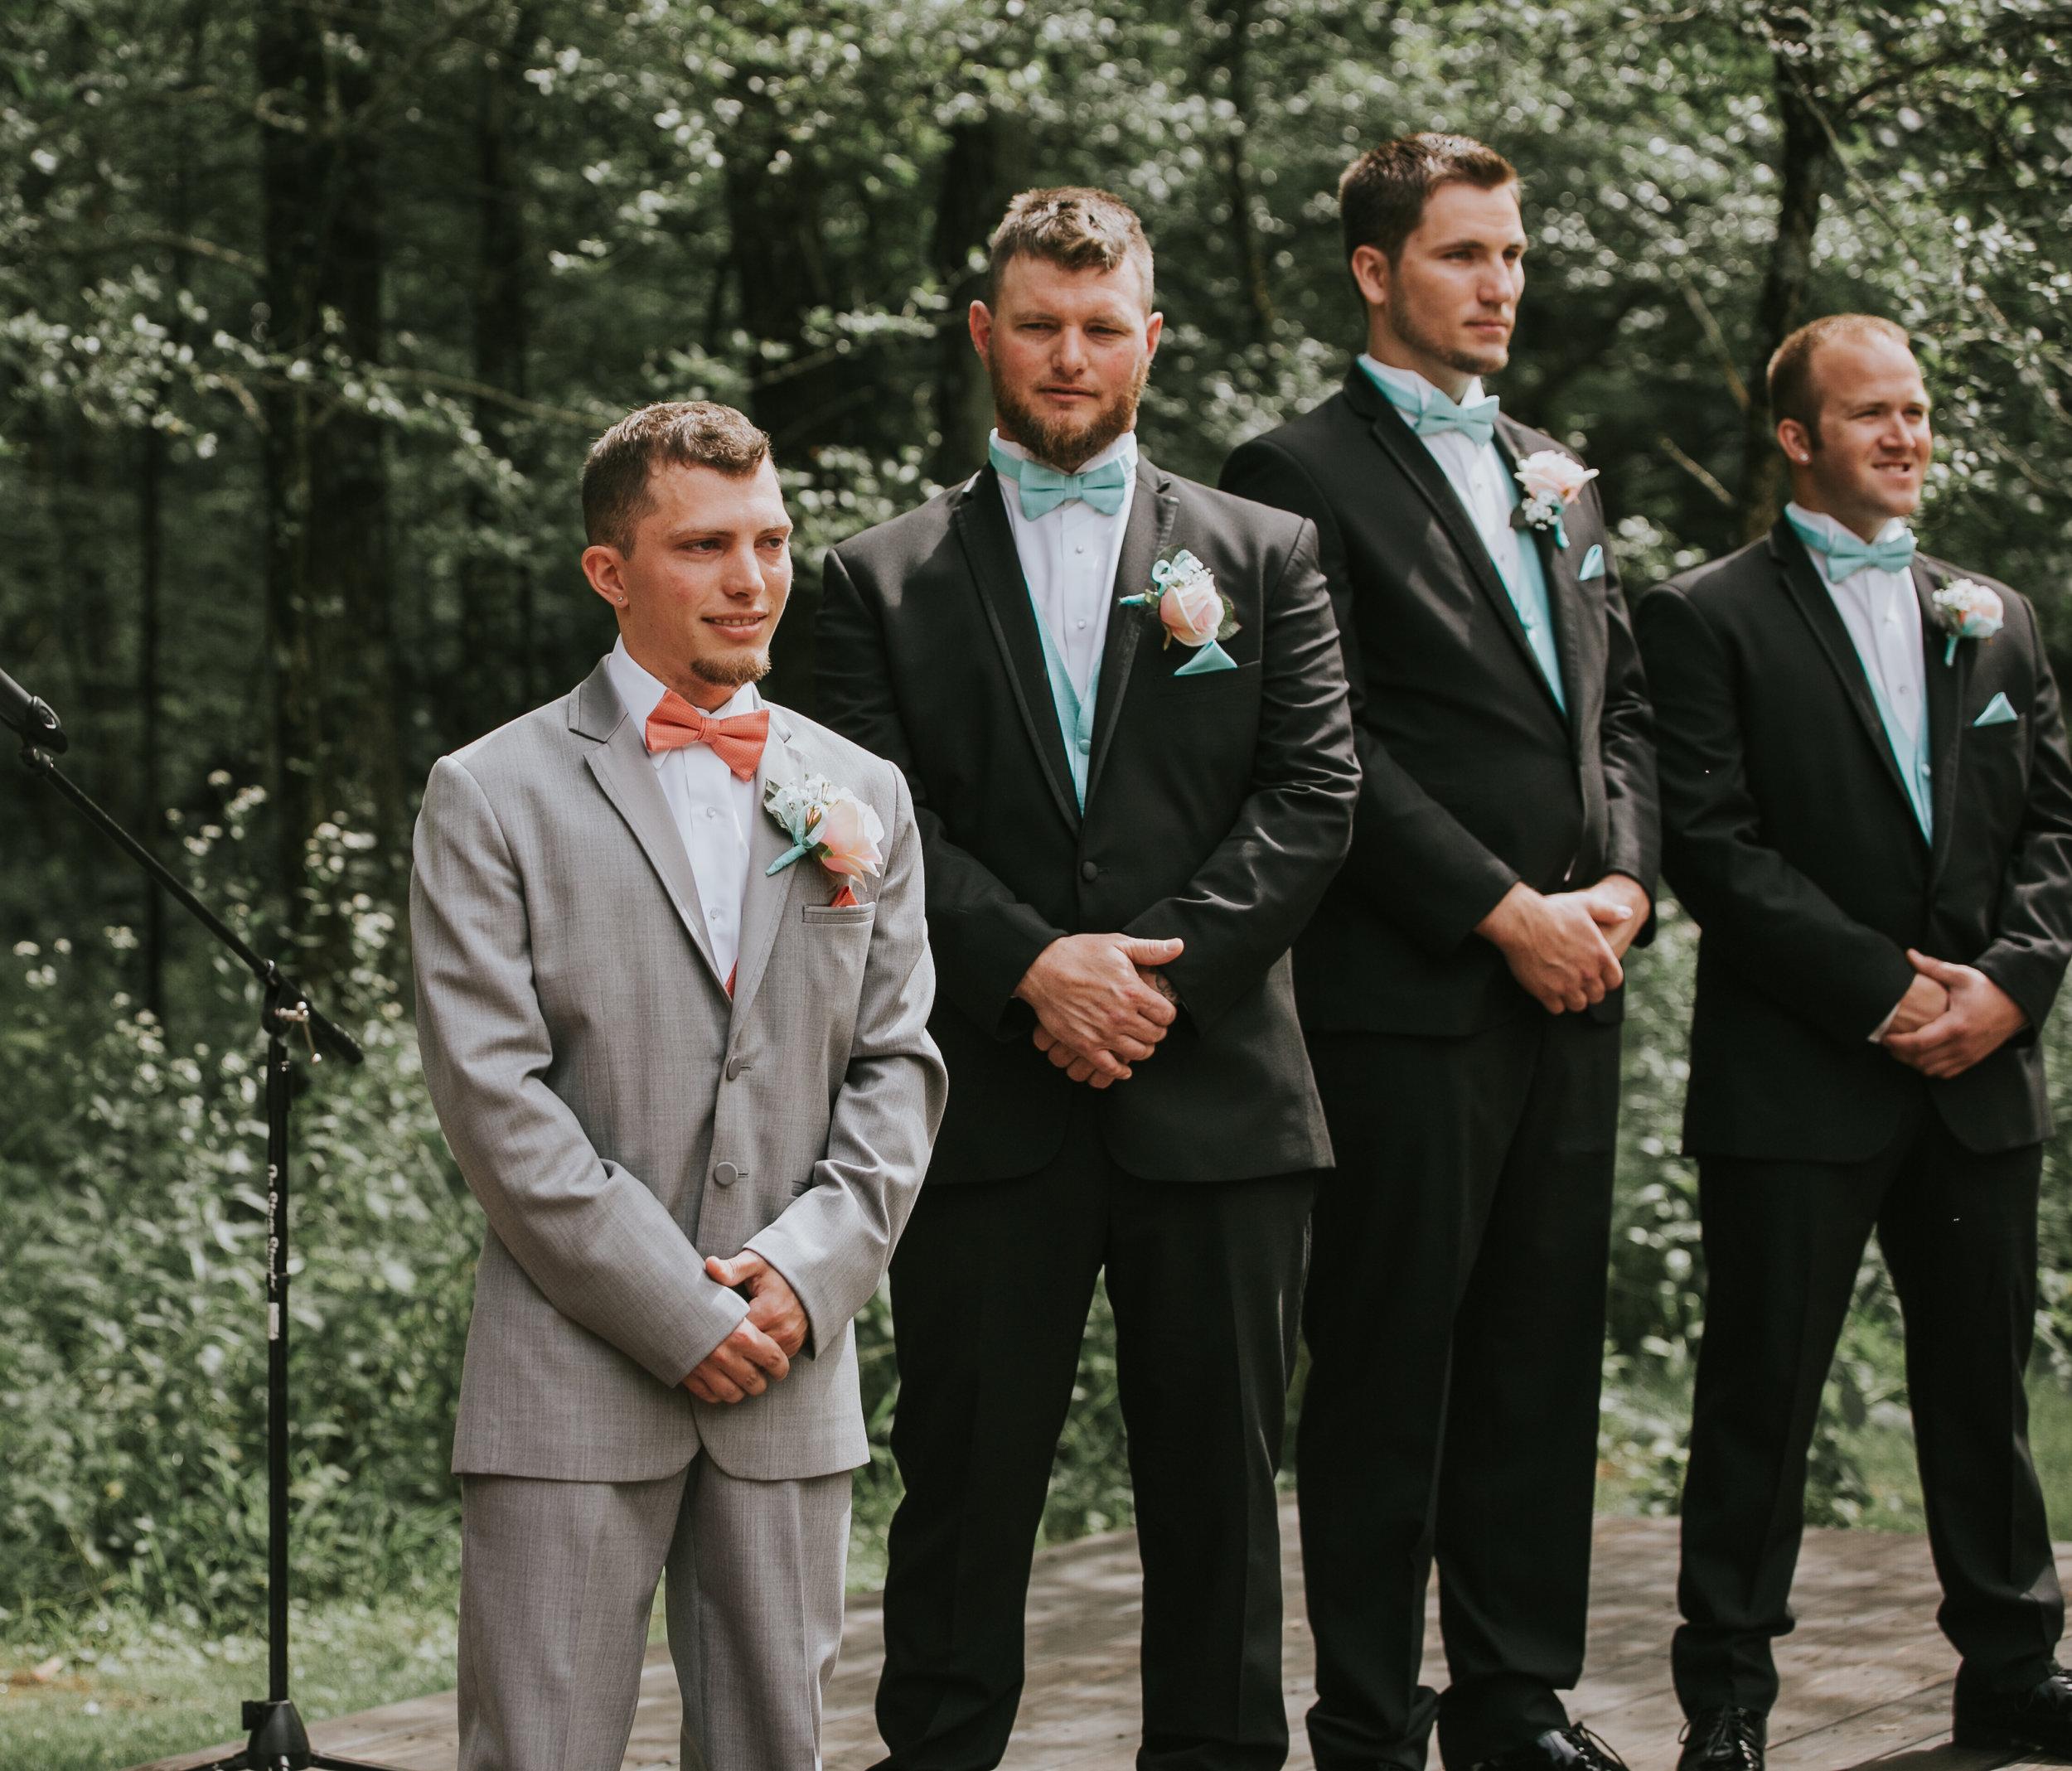 McDaniel Wedding 2017-548.jpg